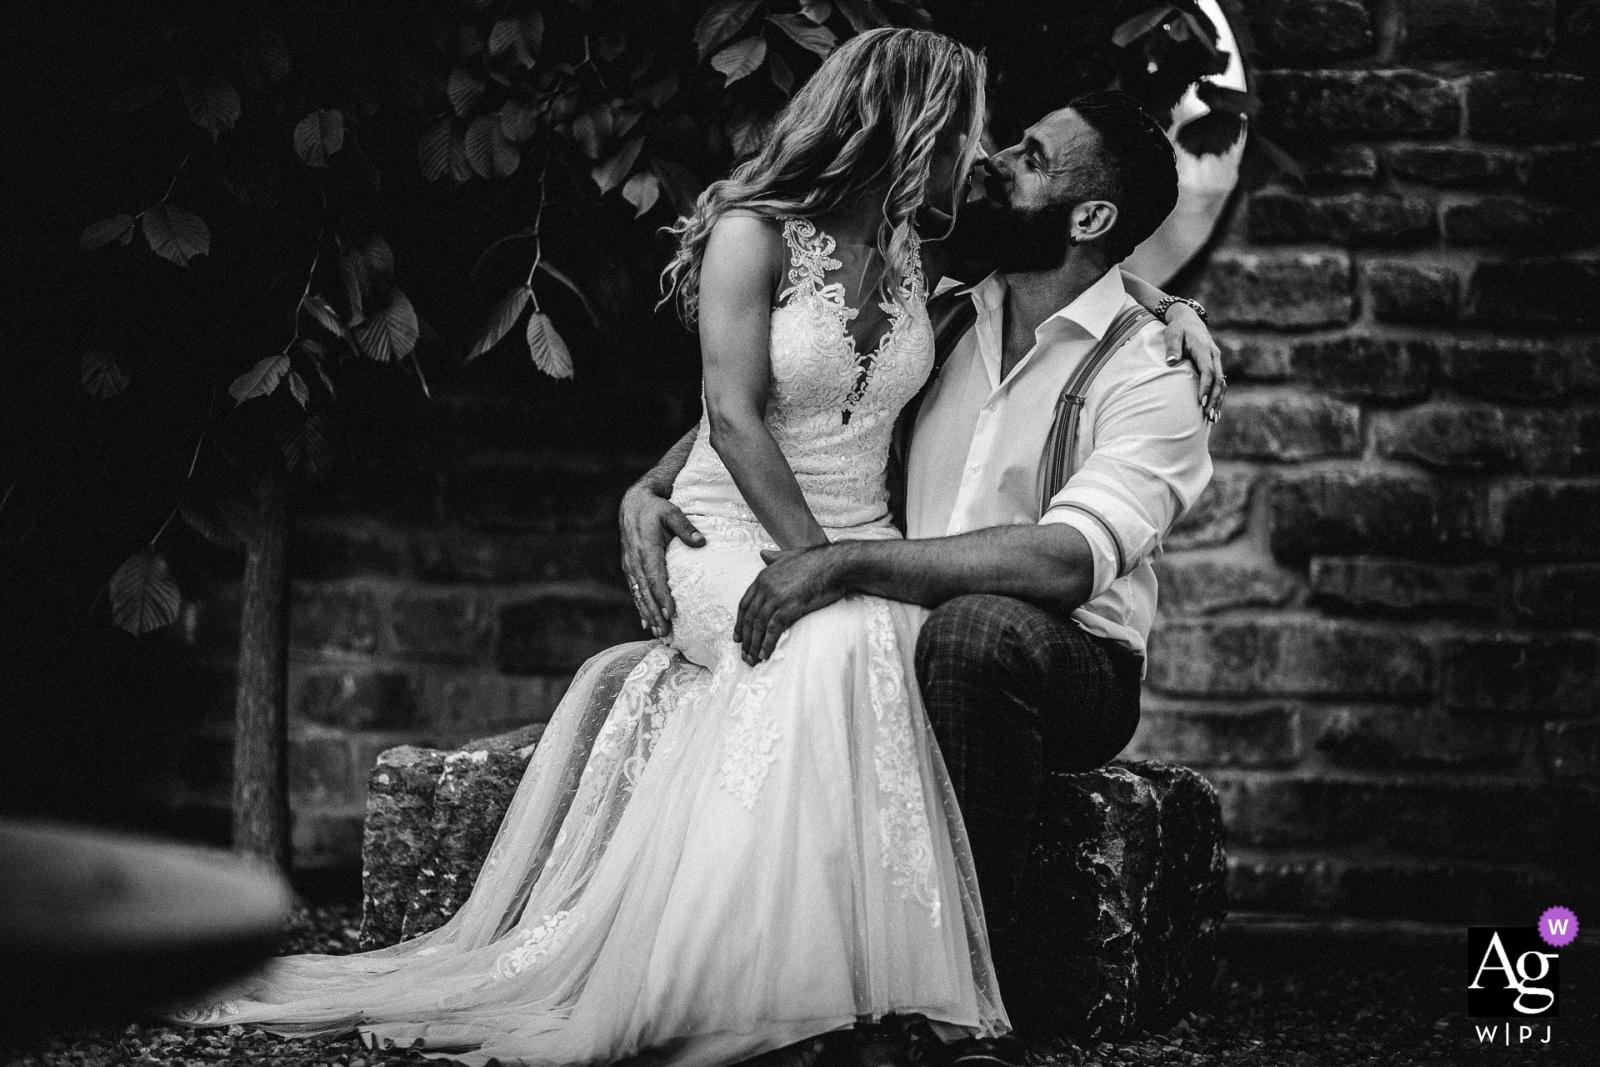 Manufaktur by Baier - Pfaffenhofen | Creative wedding portrait in black and white of the couple